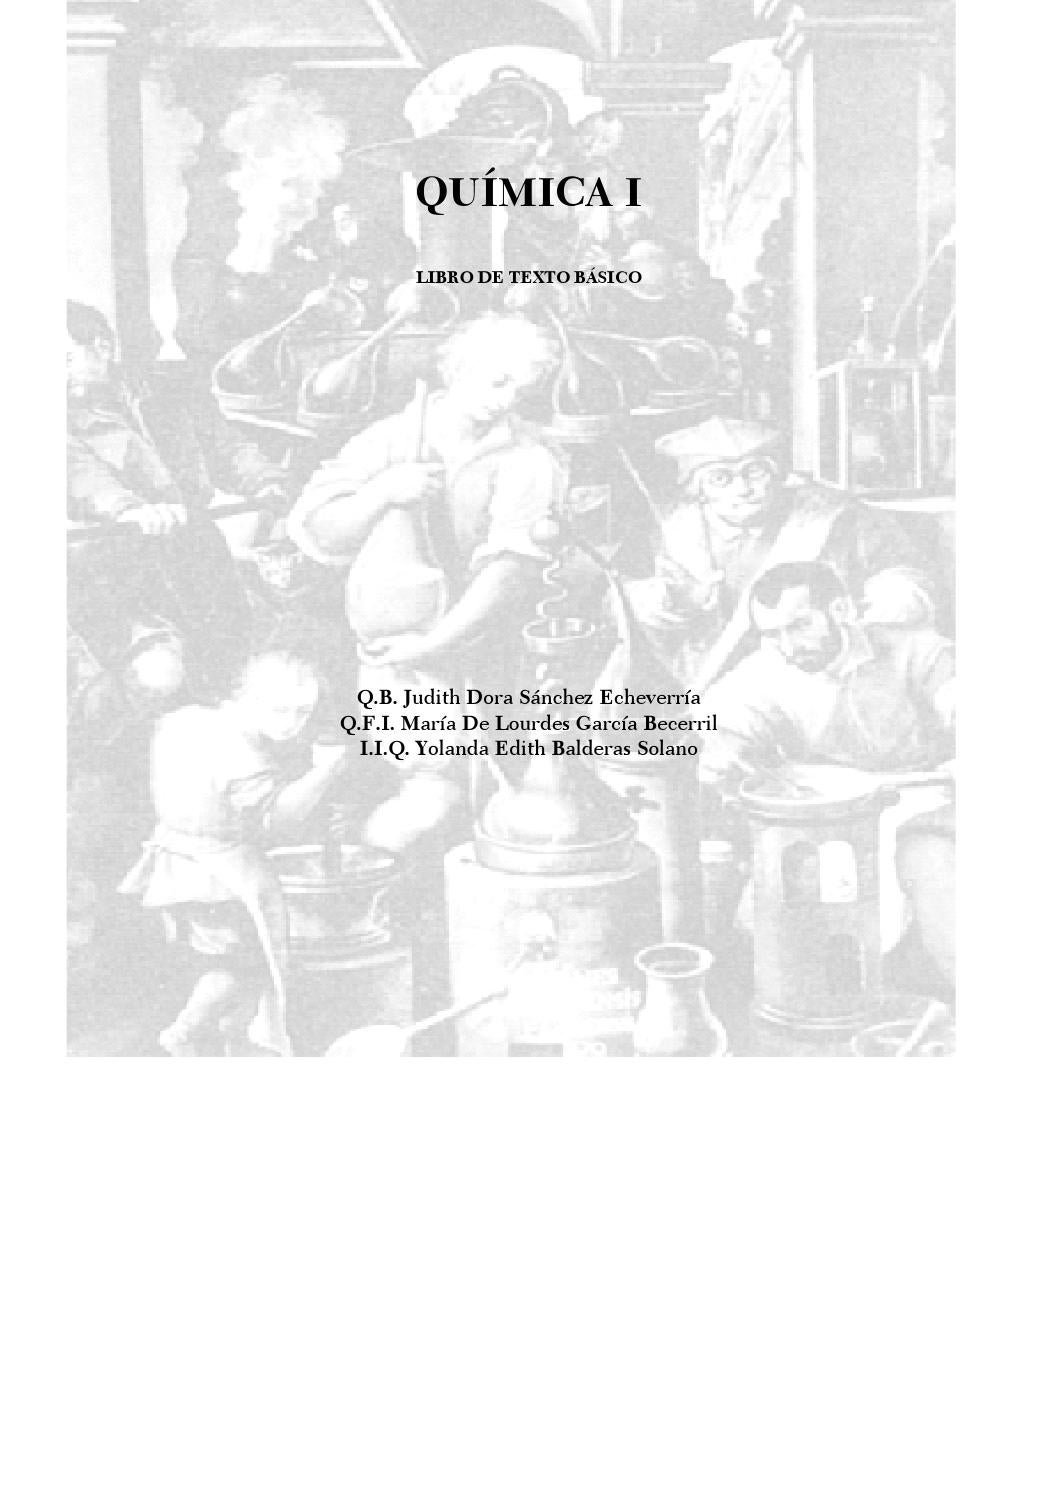 Quimica i judith dora sanchez by erik alejandro jasso for Resumen del libro quimica en la cocina